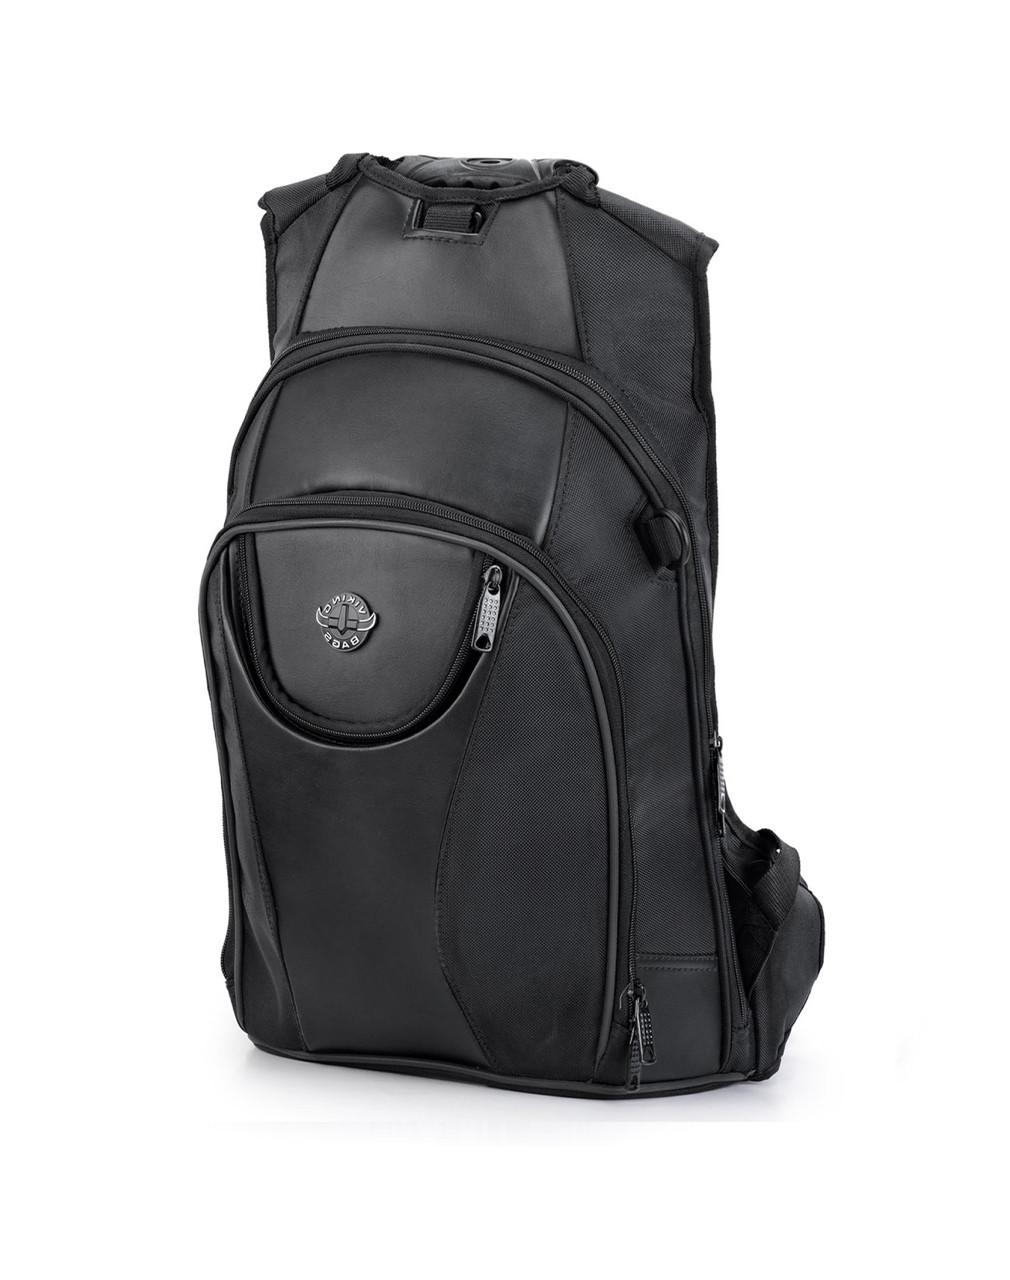 Triumph Viking Motorcycle Large Backpack Main Bag View